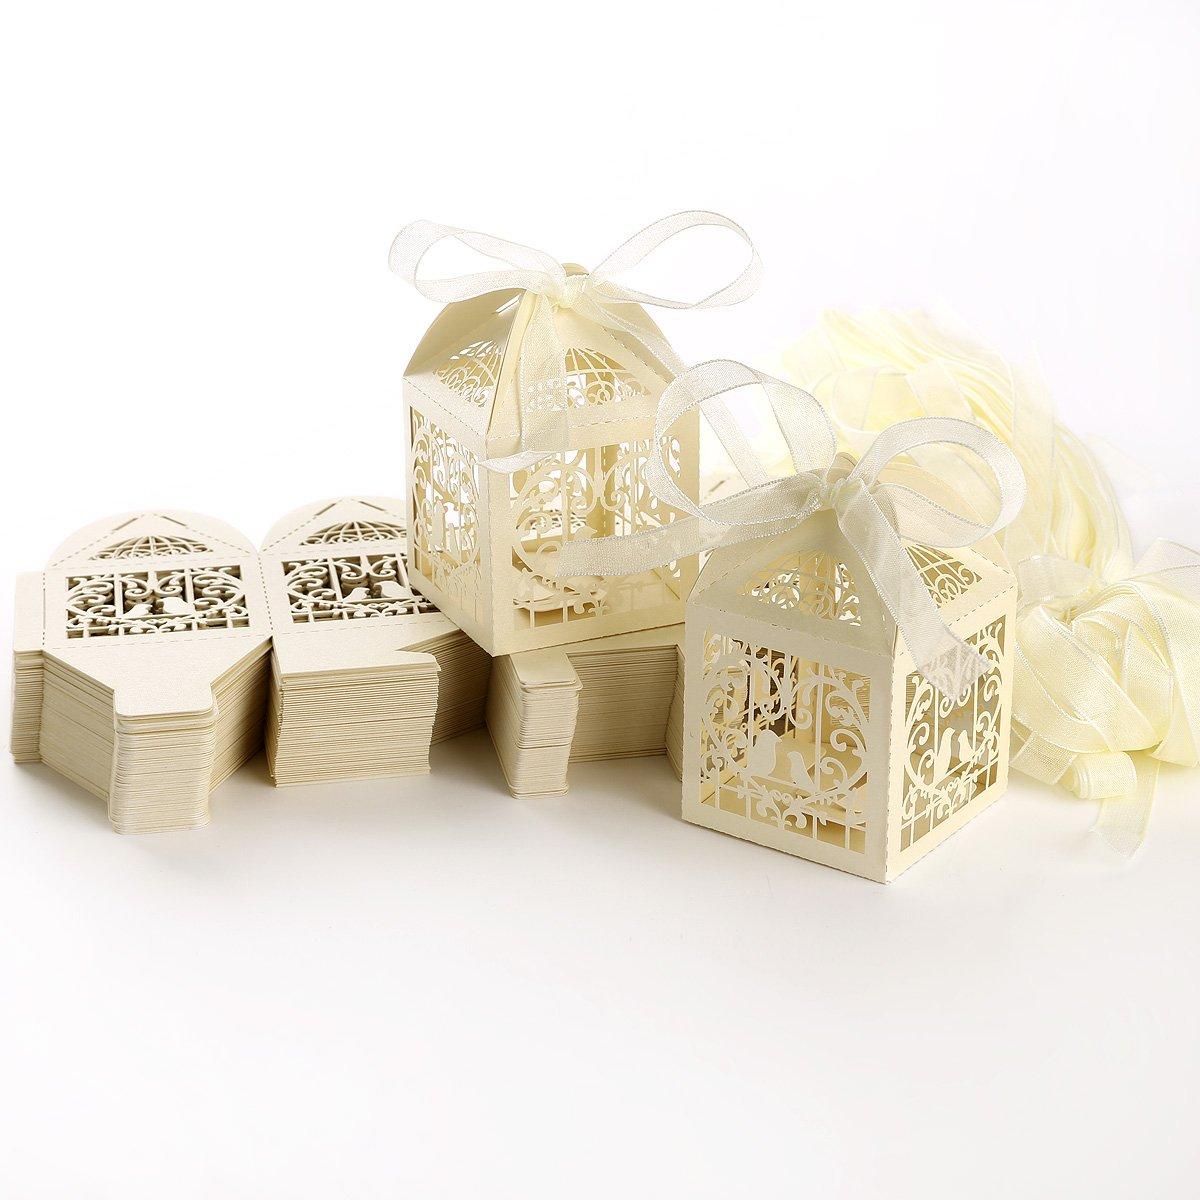 100pcs Carving gabbia cartuccia Candy scatole regalo matrimonio favore Baby Shower